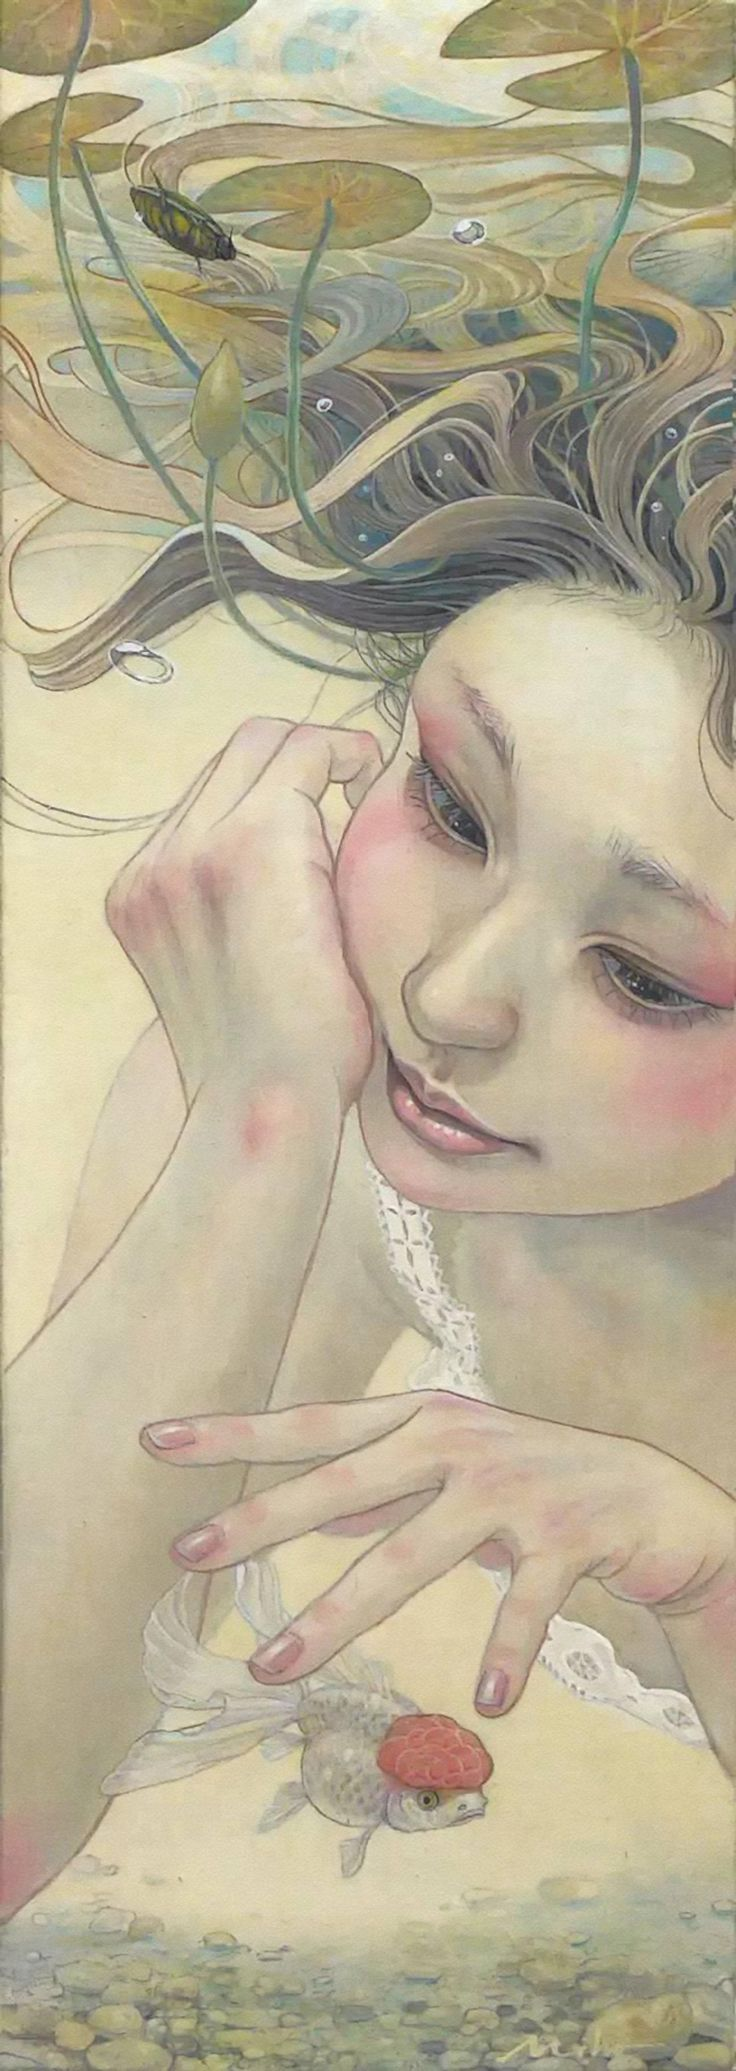 """Heart of Water"" - Miho Hirano 平野実穂, watercolor, 2015 {beautiful female head hands underwater woman face portrait painting #lovart} mihohirano.strikingly.com"